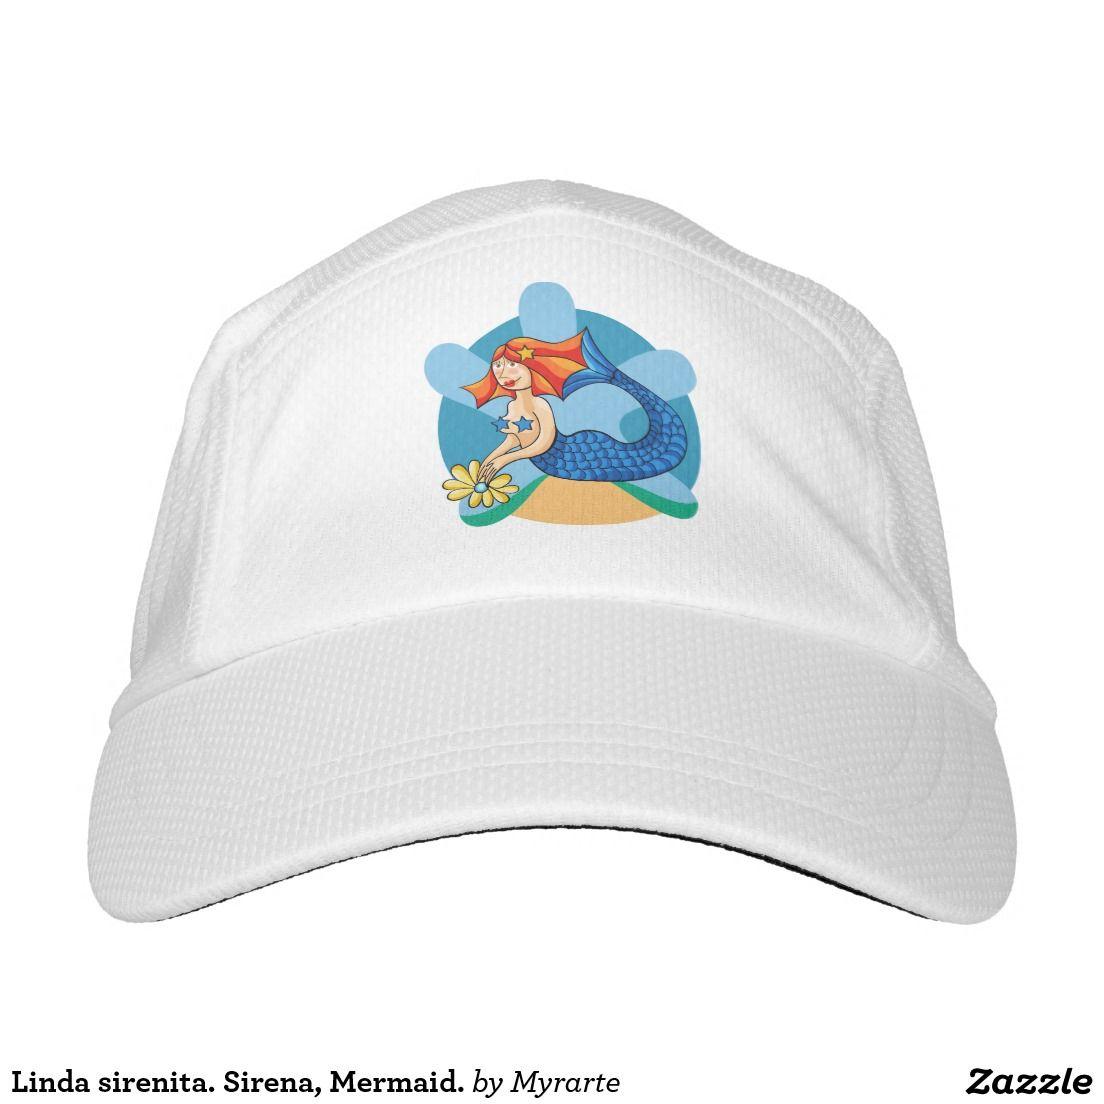 7d2f1cf9fbbd Linda sirenita. Sirena, Mermaid. Hat | Zazzle.com | Gorra - hat ...